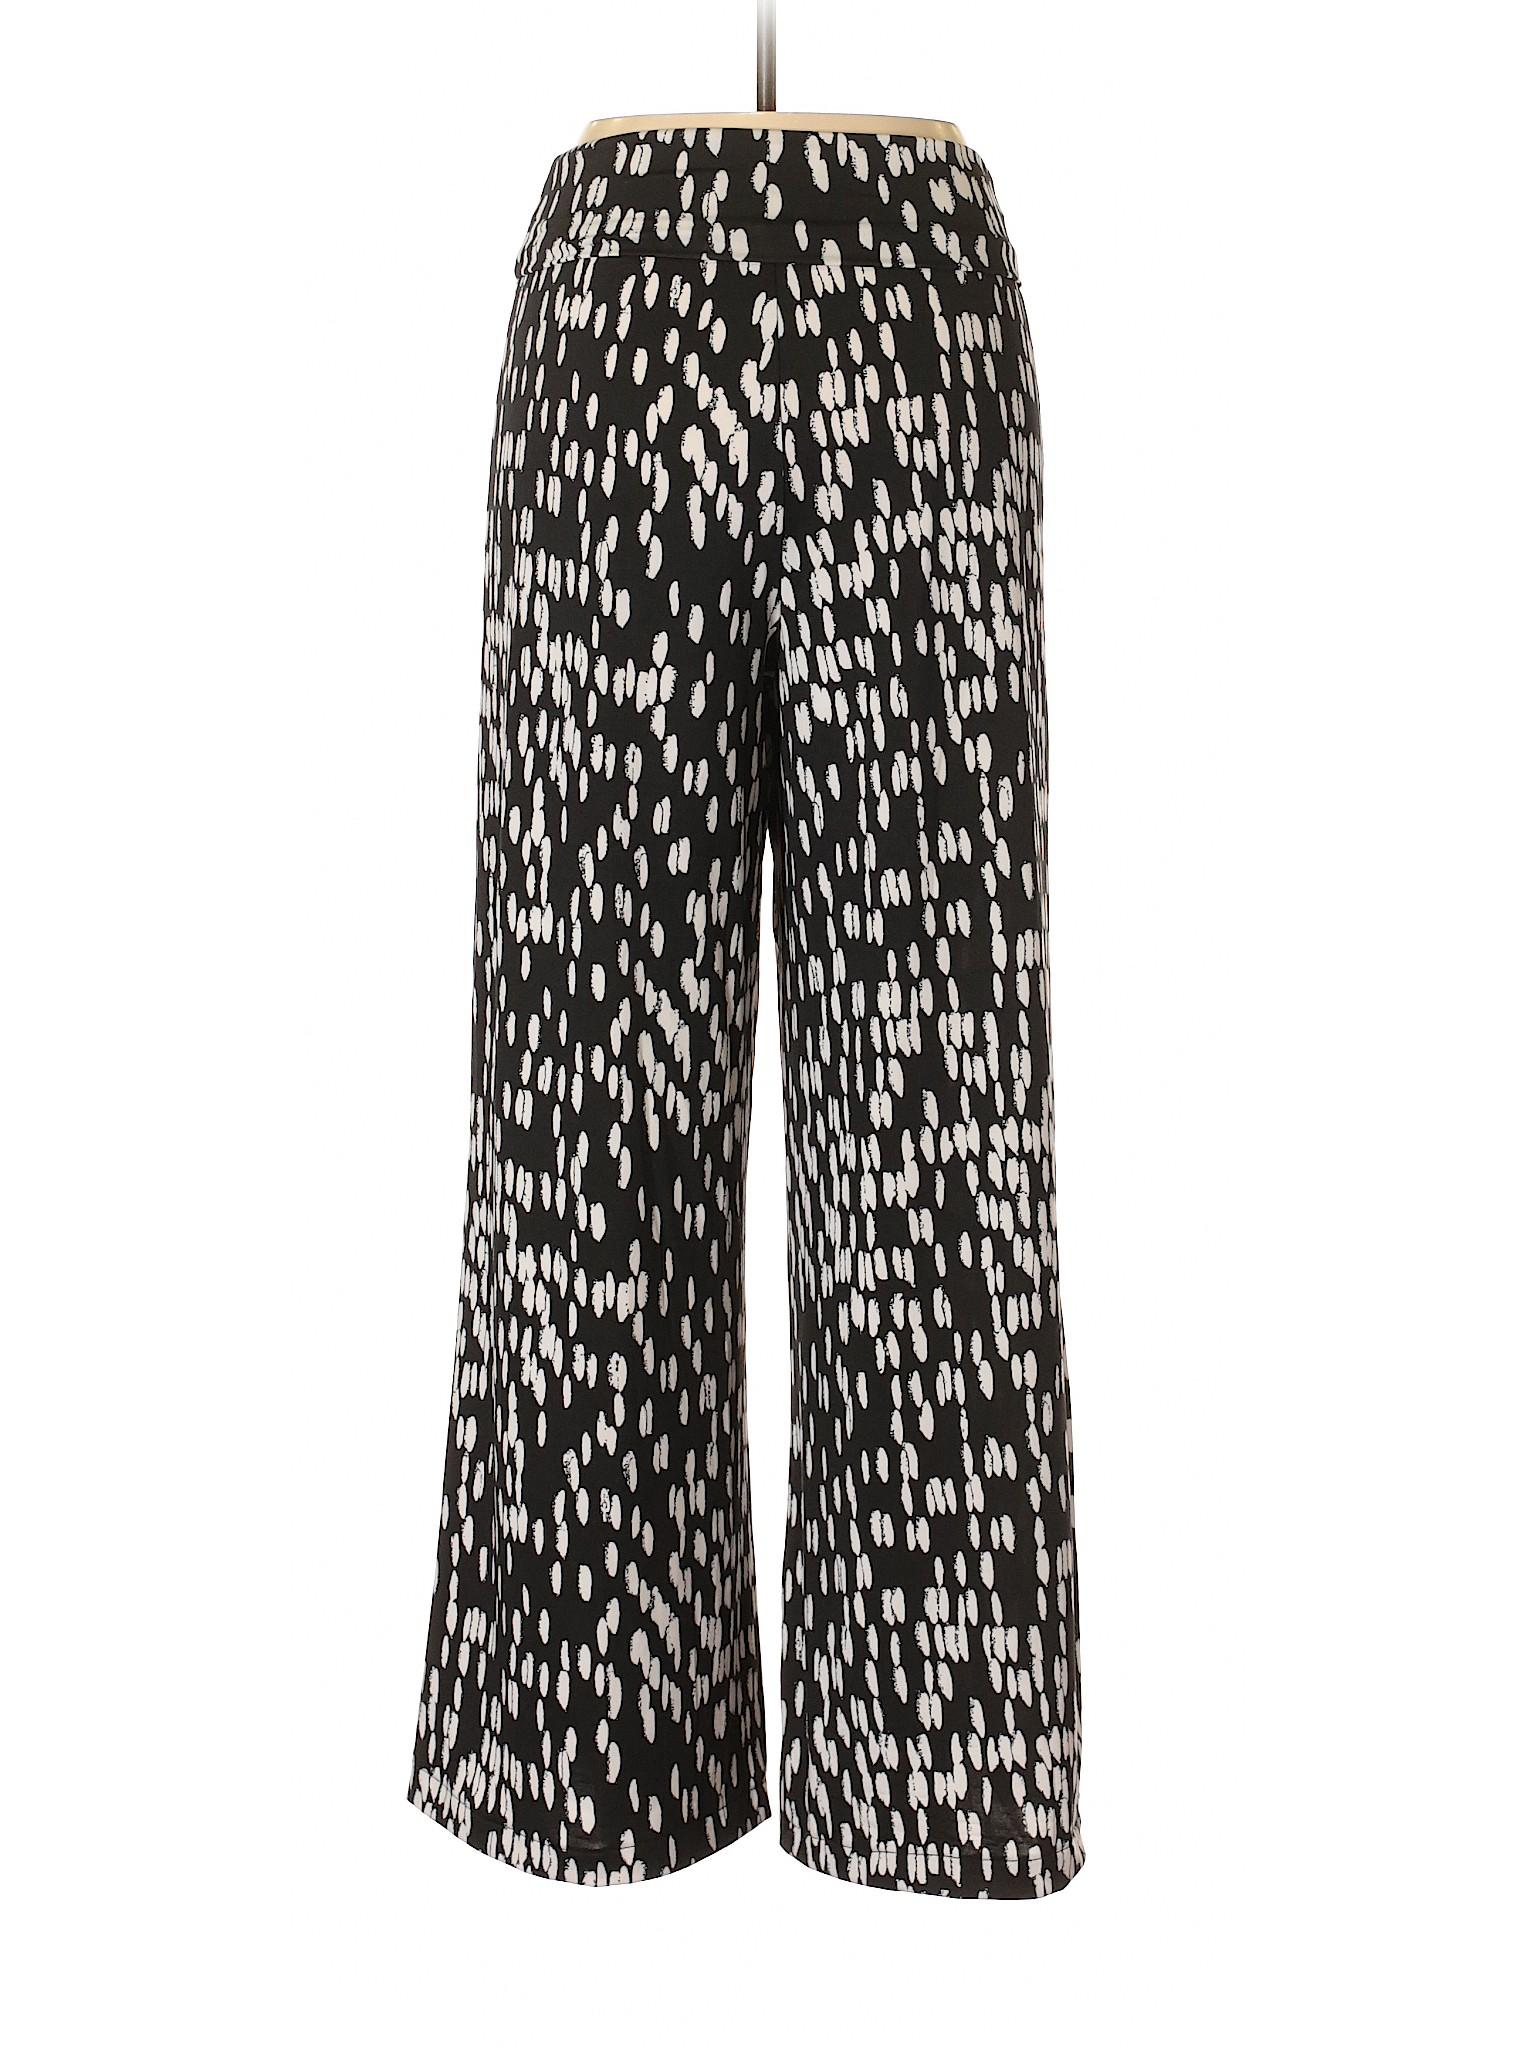 leisure Casual New Pants Directions Boutique a0dwZvBqZ